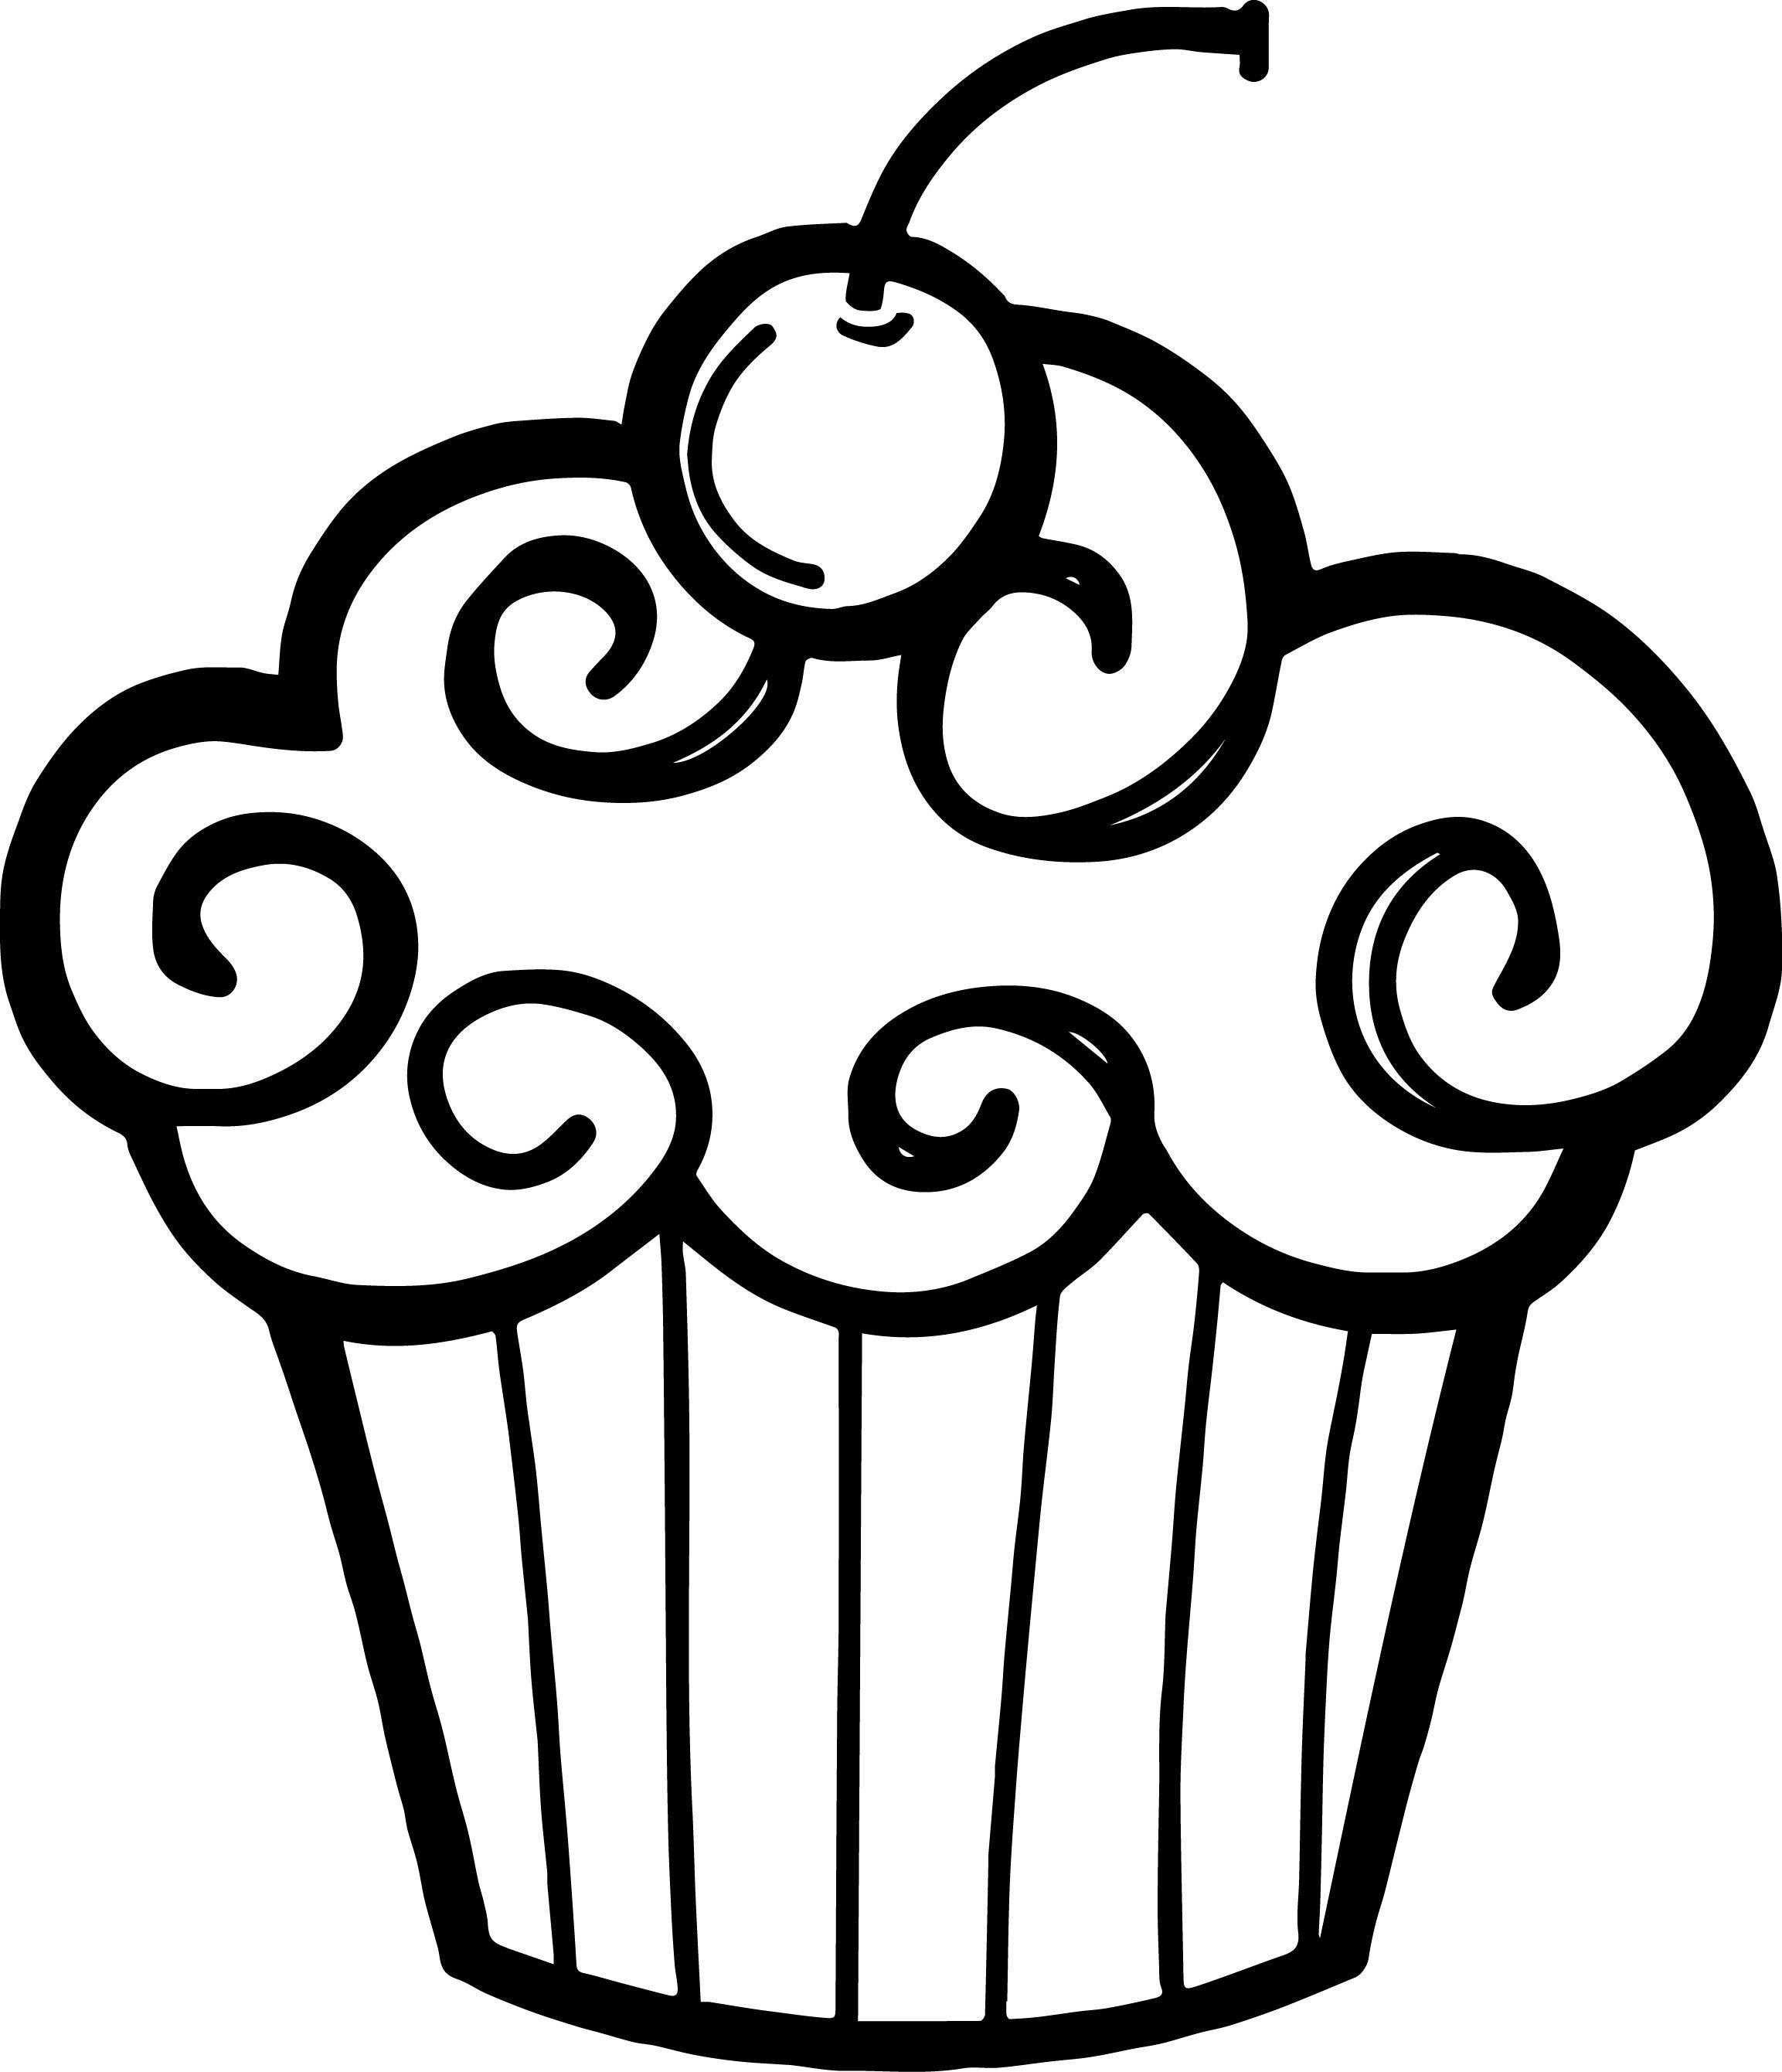 Happy Birthday Cupcake Clip . - Cupcake Clipart Black And White